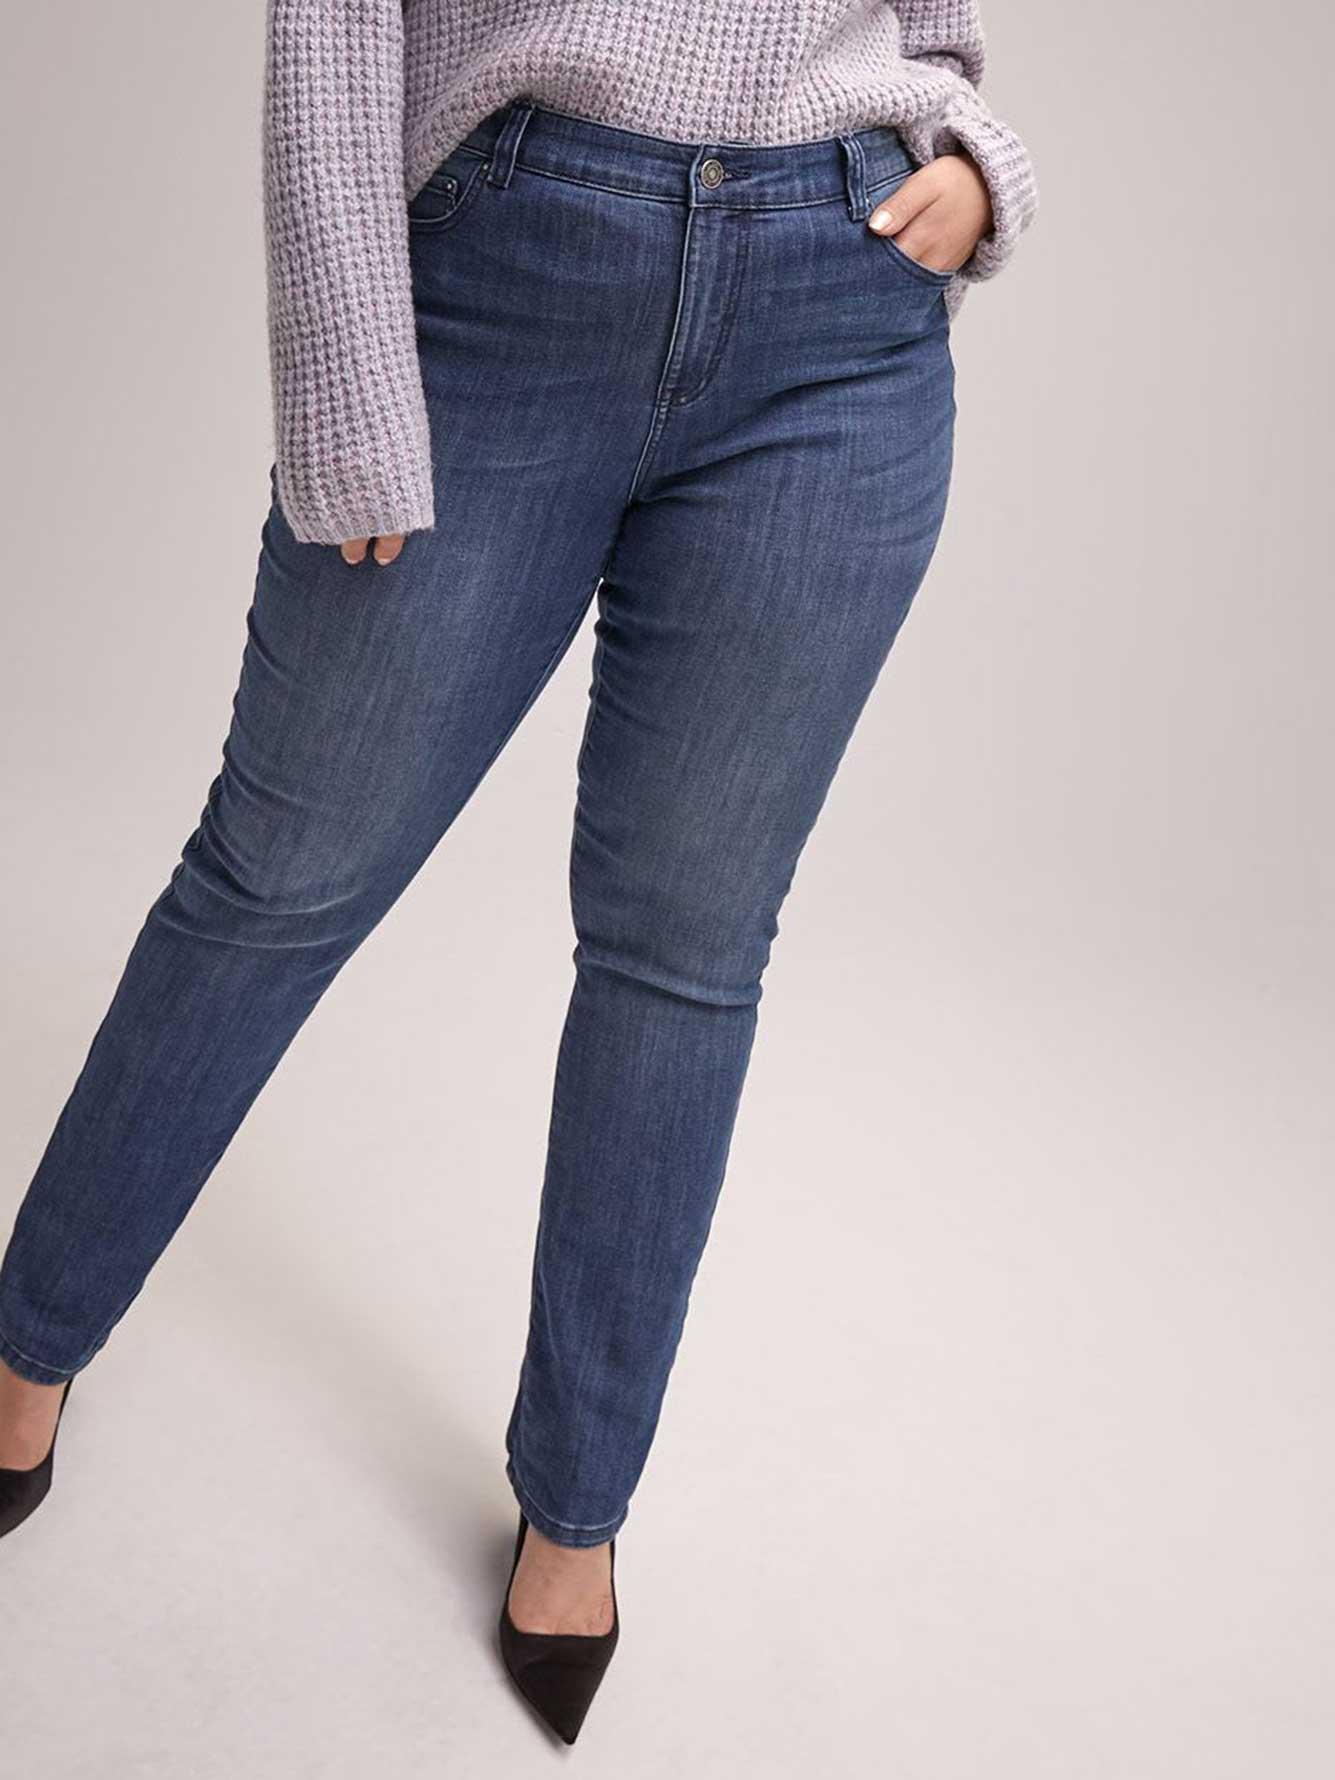 green-petite-straight-leg-jeans-gamer-girl-cumshot-gif